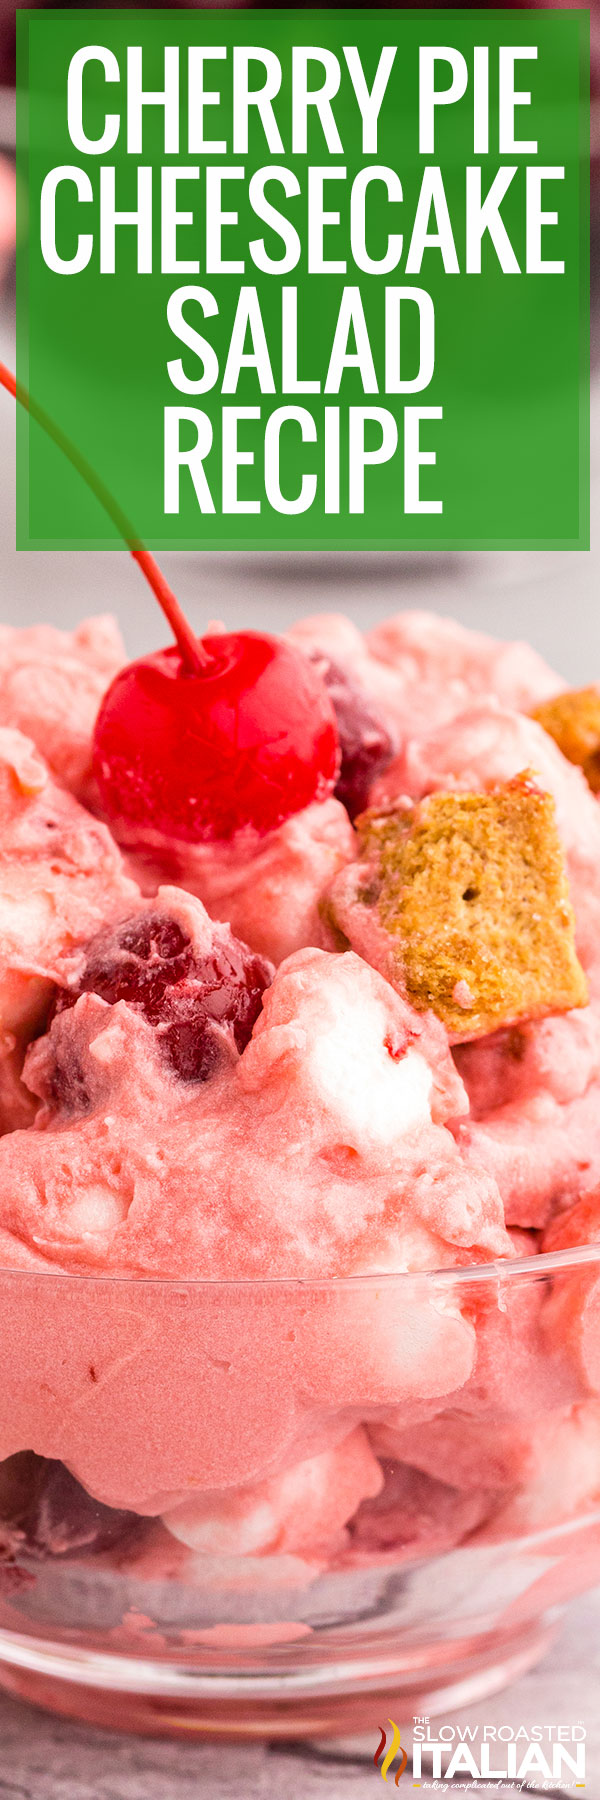 Cherry Pie Cheesecake Salad Recipe close up